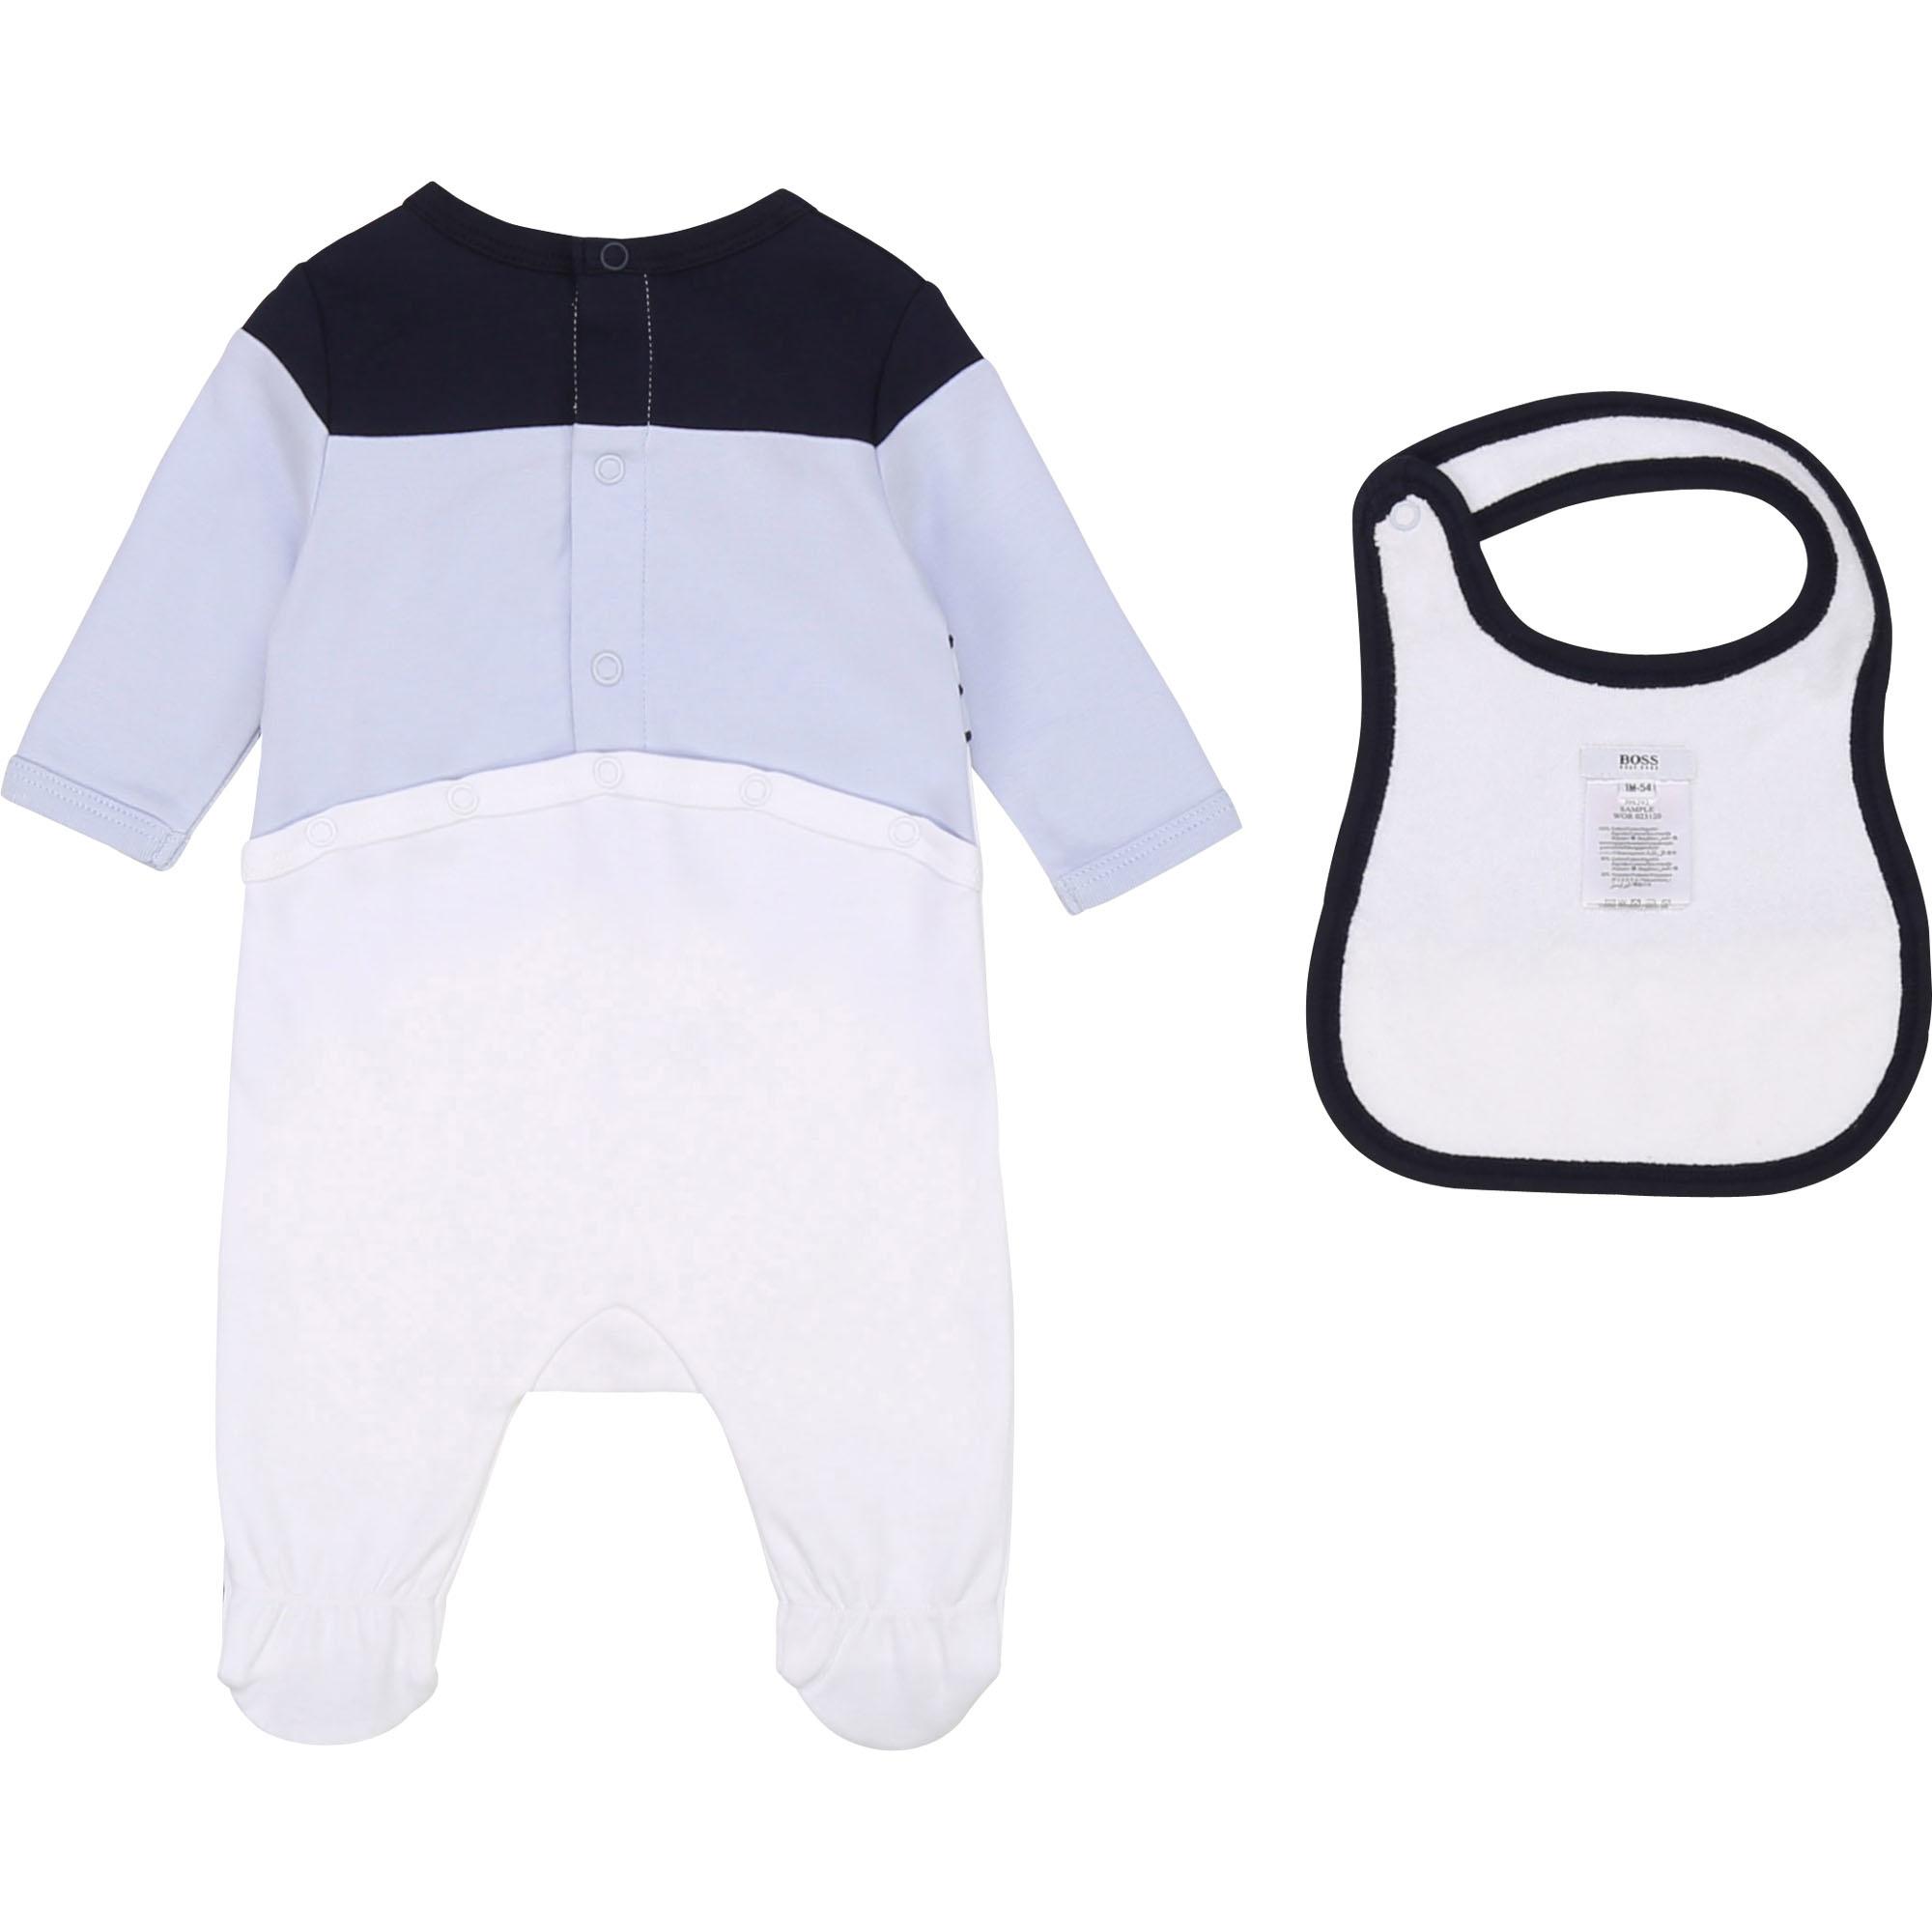 BOSS ensemble pyjama bavoir coton-2